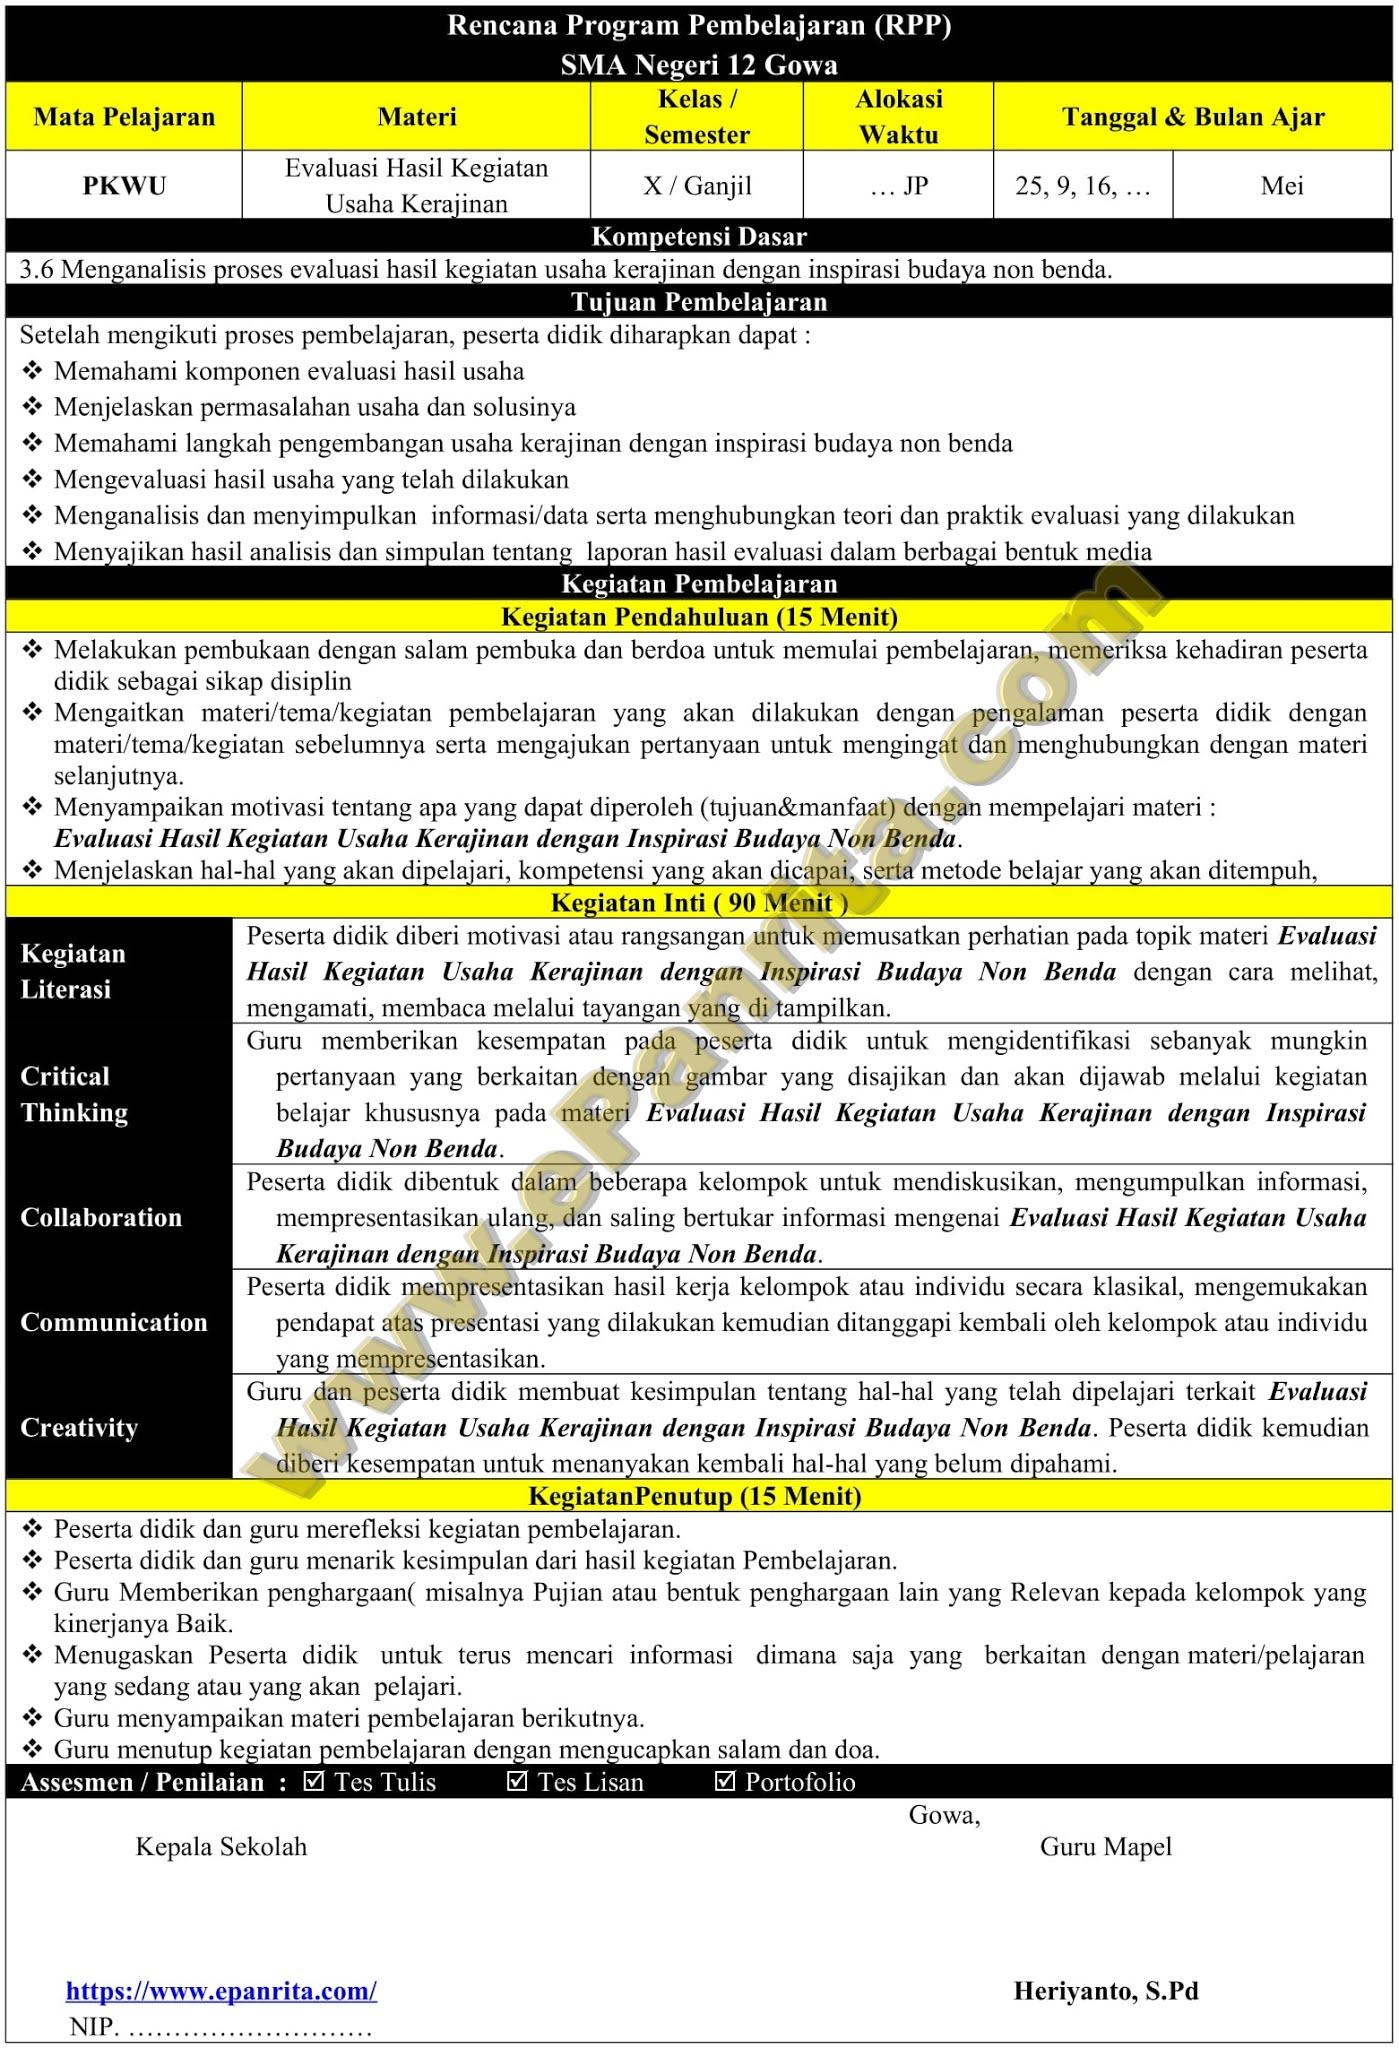 RPP 1 Halaman Prakarya Aspek Kerajinan (Evaluasi Hasil Kegiatan Usaha Kerajinan dengan Inspirasi Budaya Non Benda)